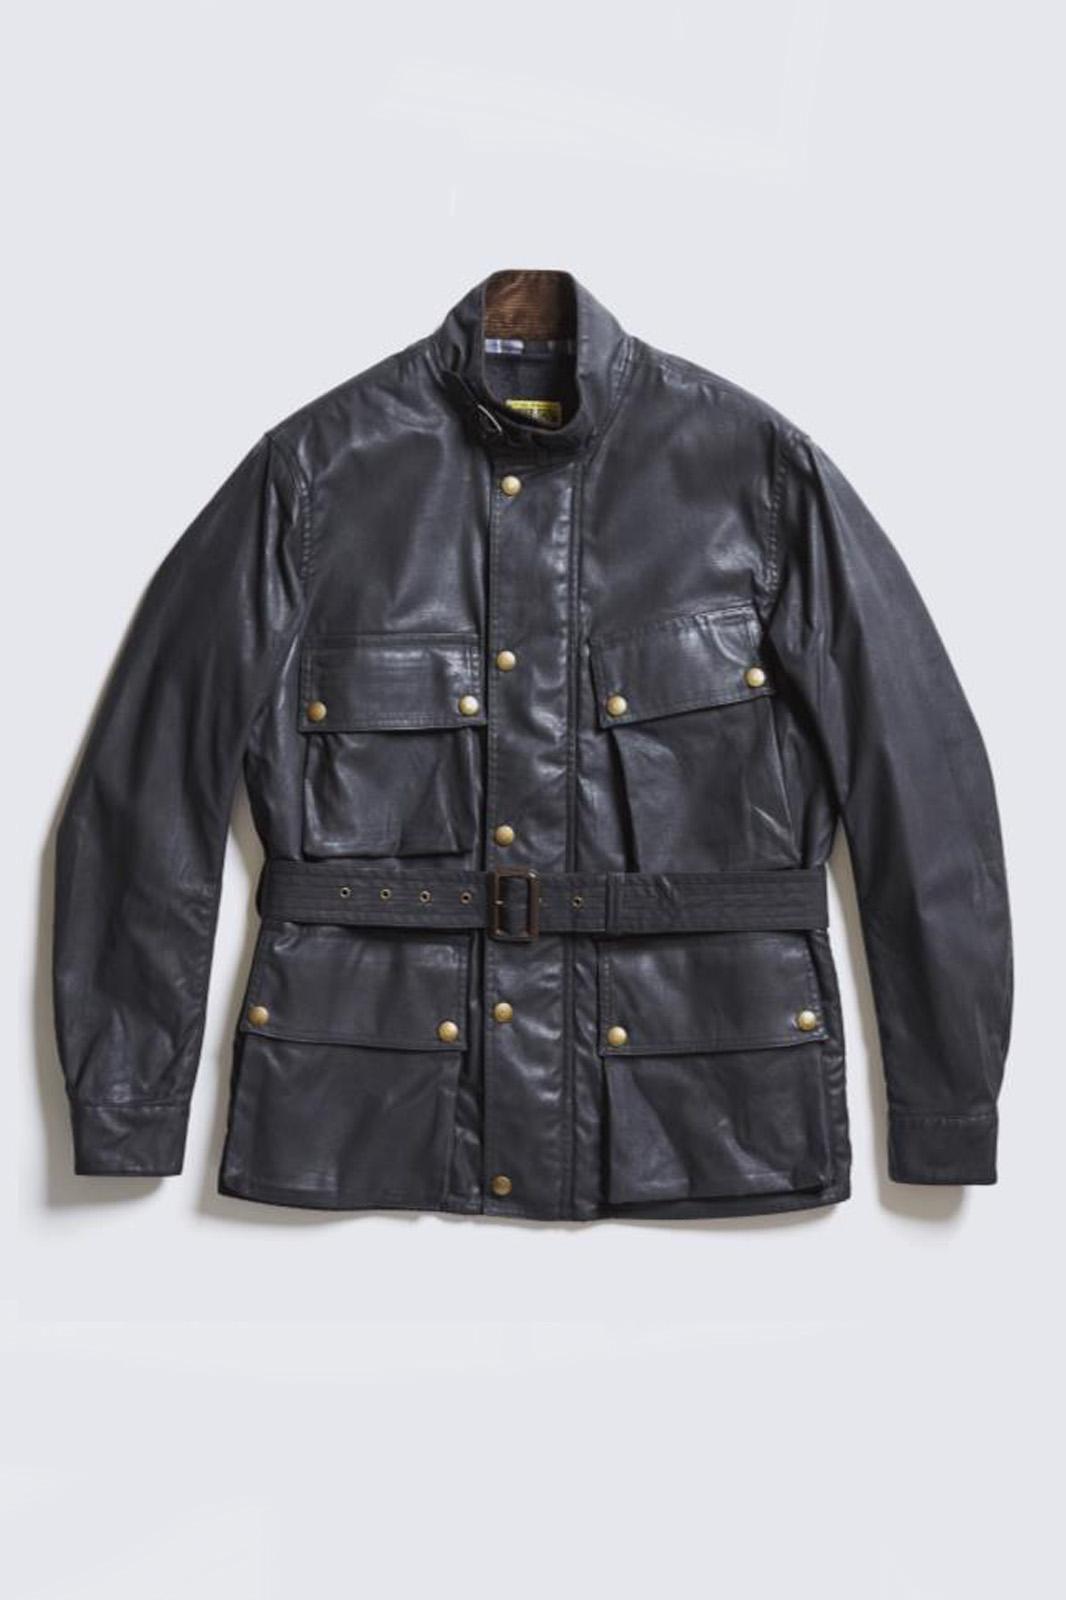 ADDICT CLOTHES JAPAN ACVM WAXED COTTON BMC JACKET BLACK